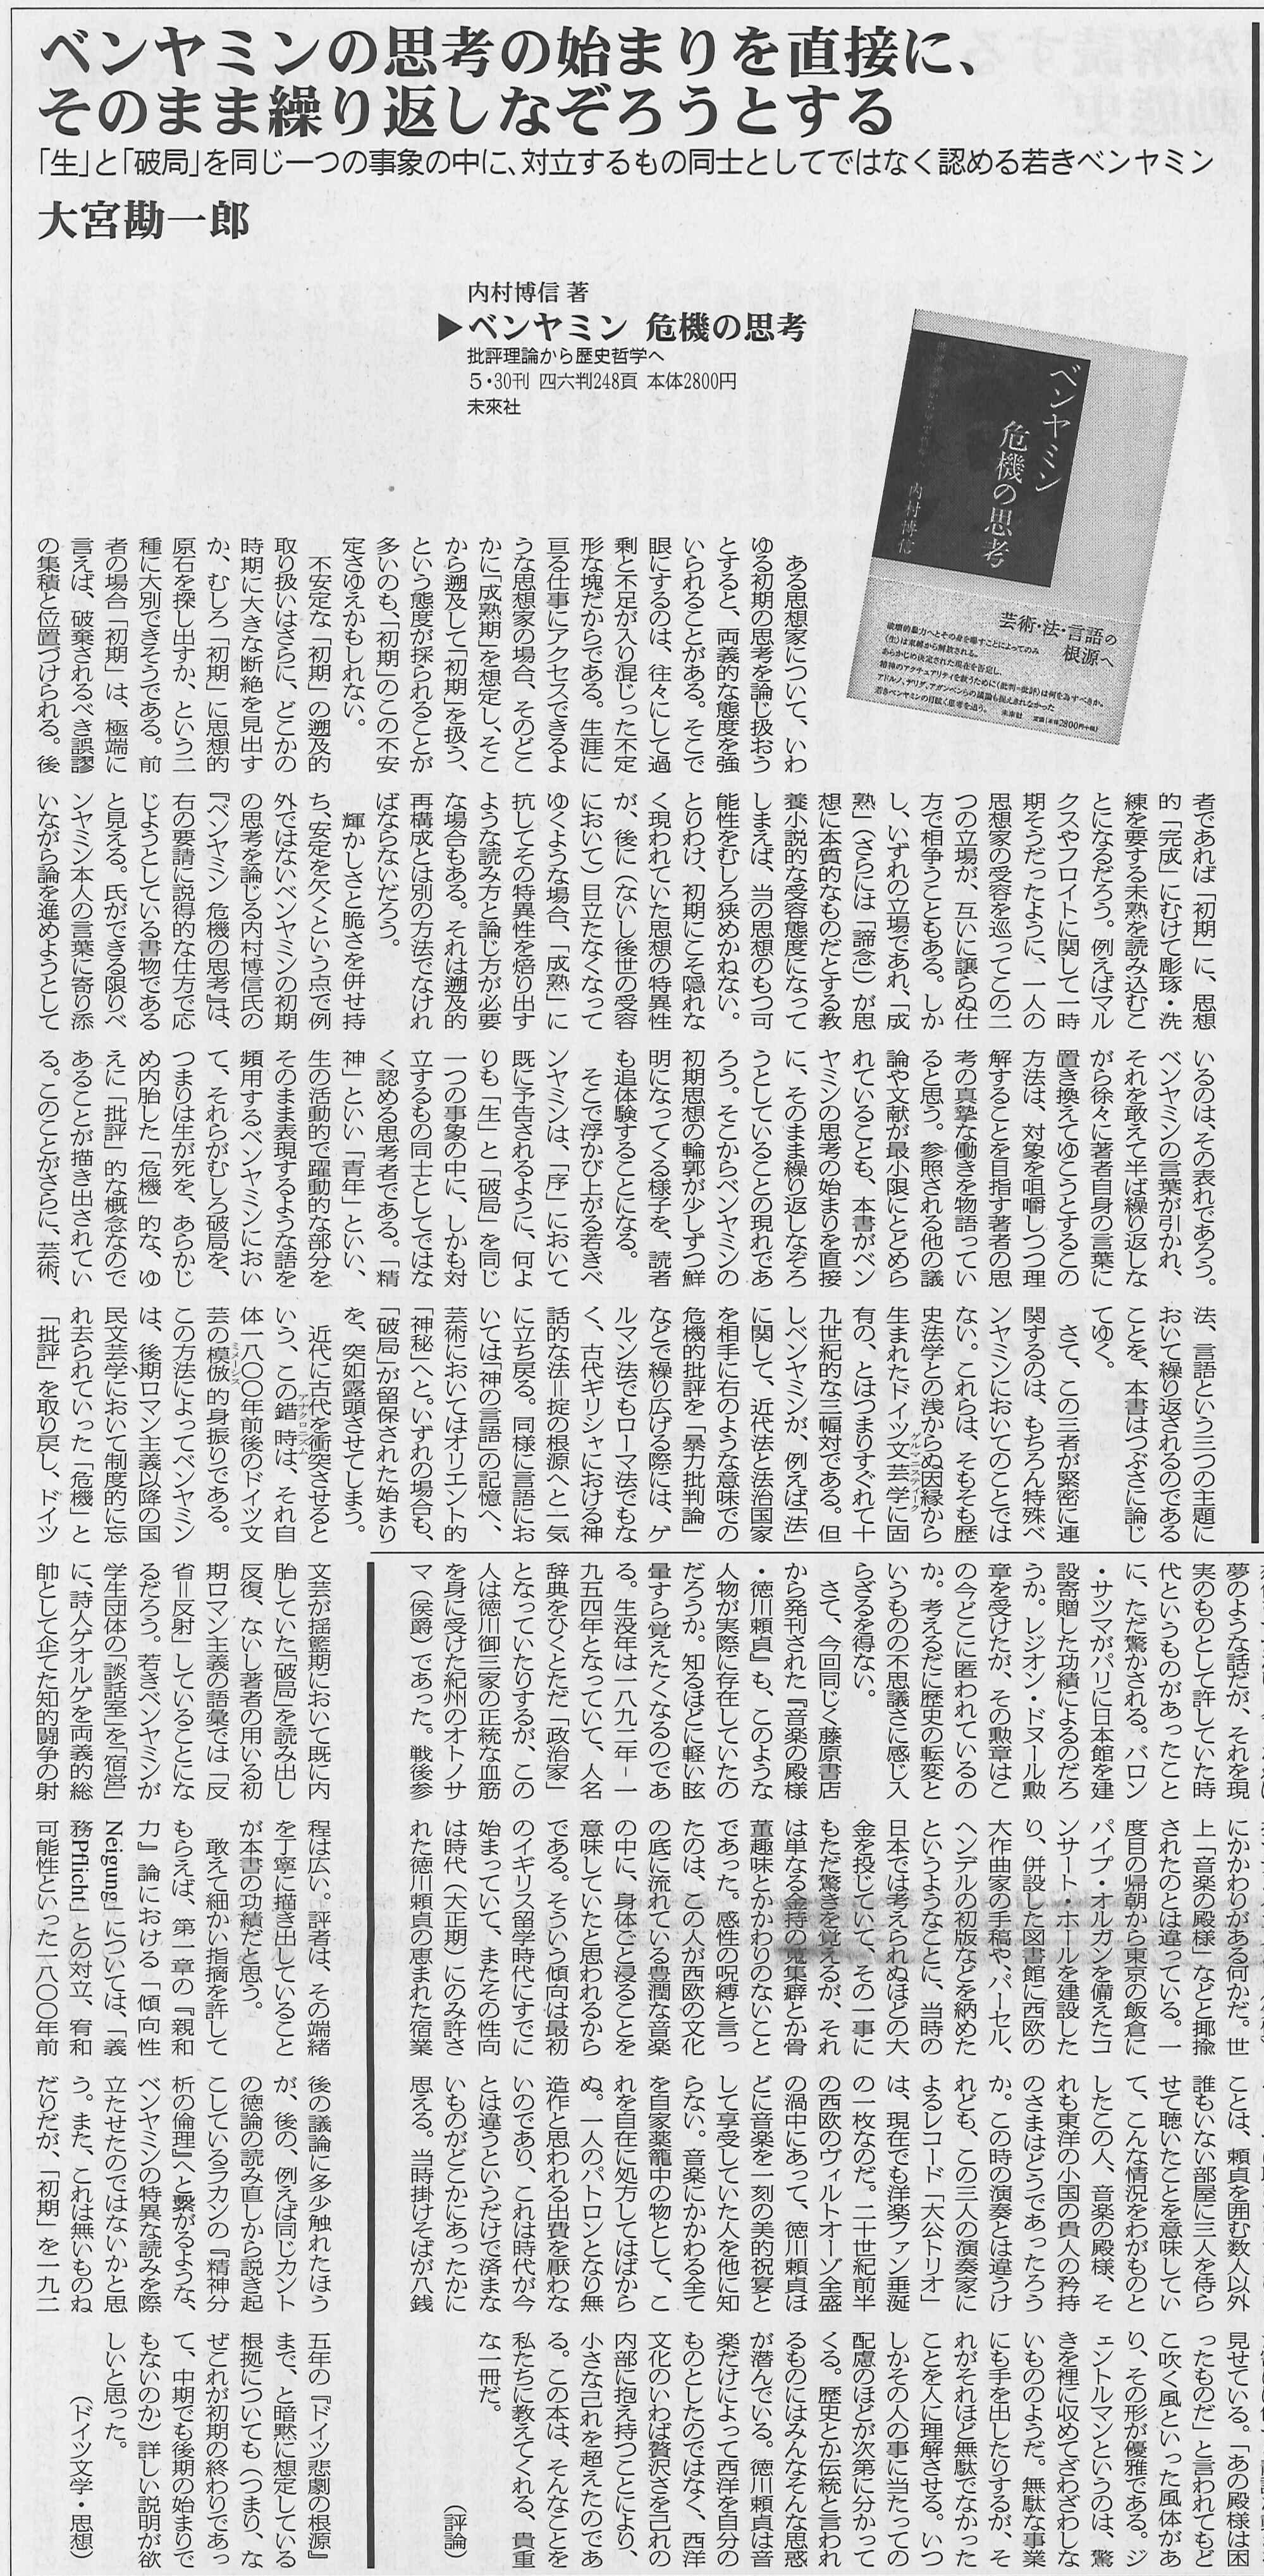 http://www.miraisha.co.jp/topics/20120820/tosyo20120818.jpg